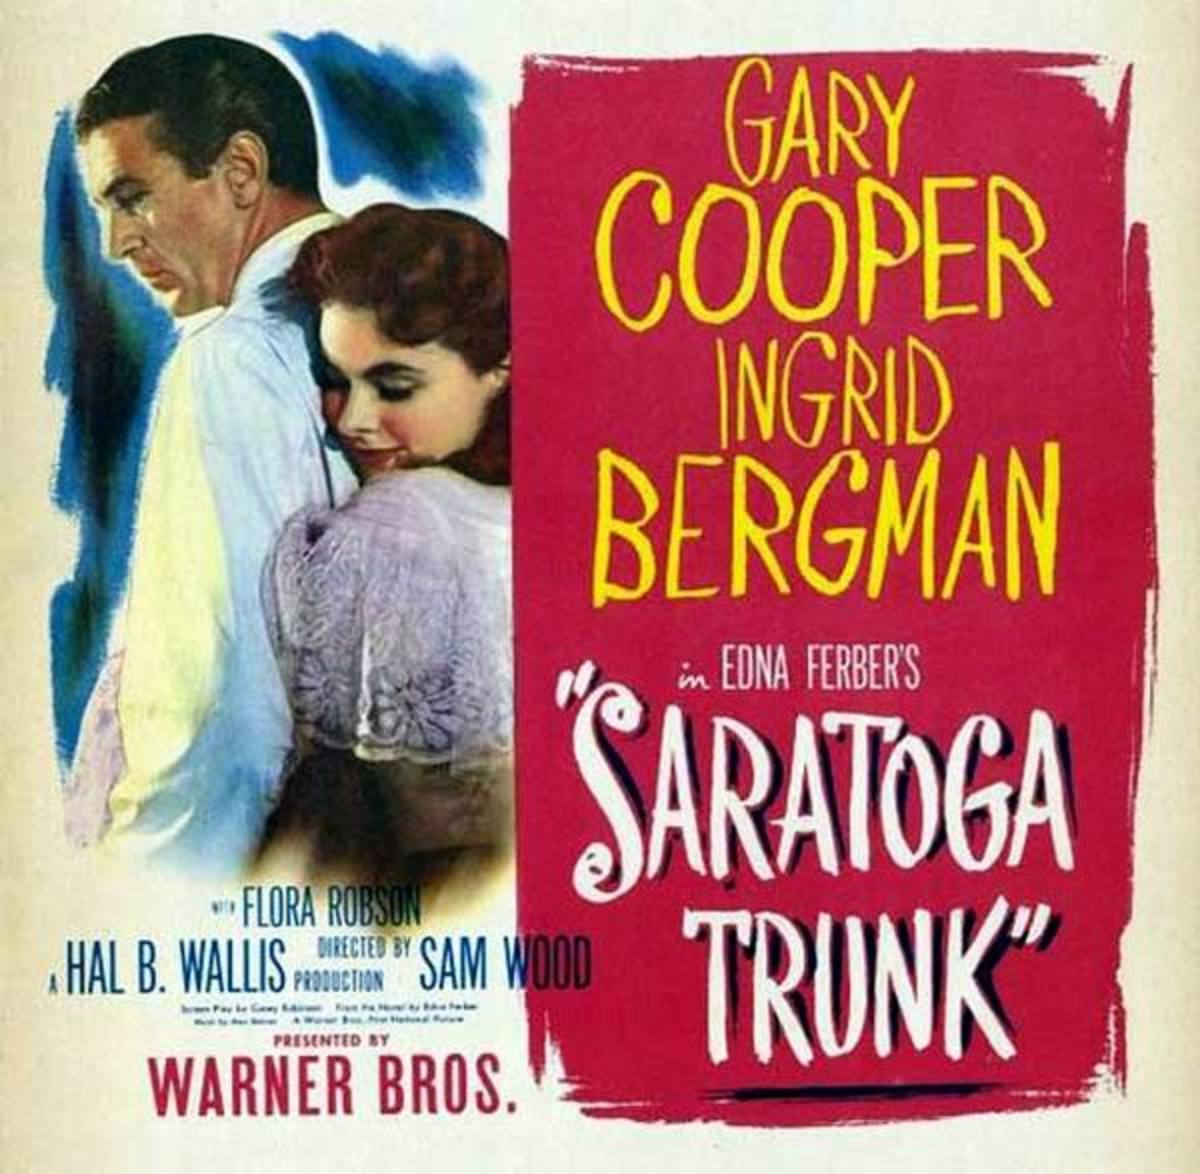 Saratoga Trunk (1945)